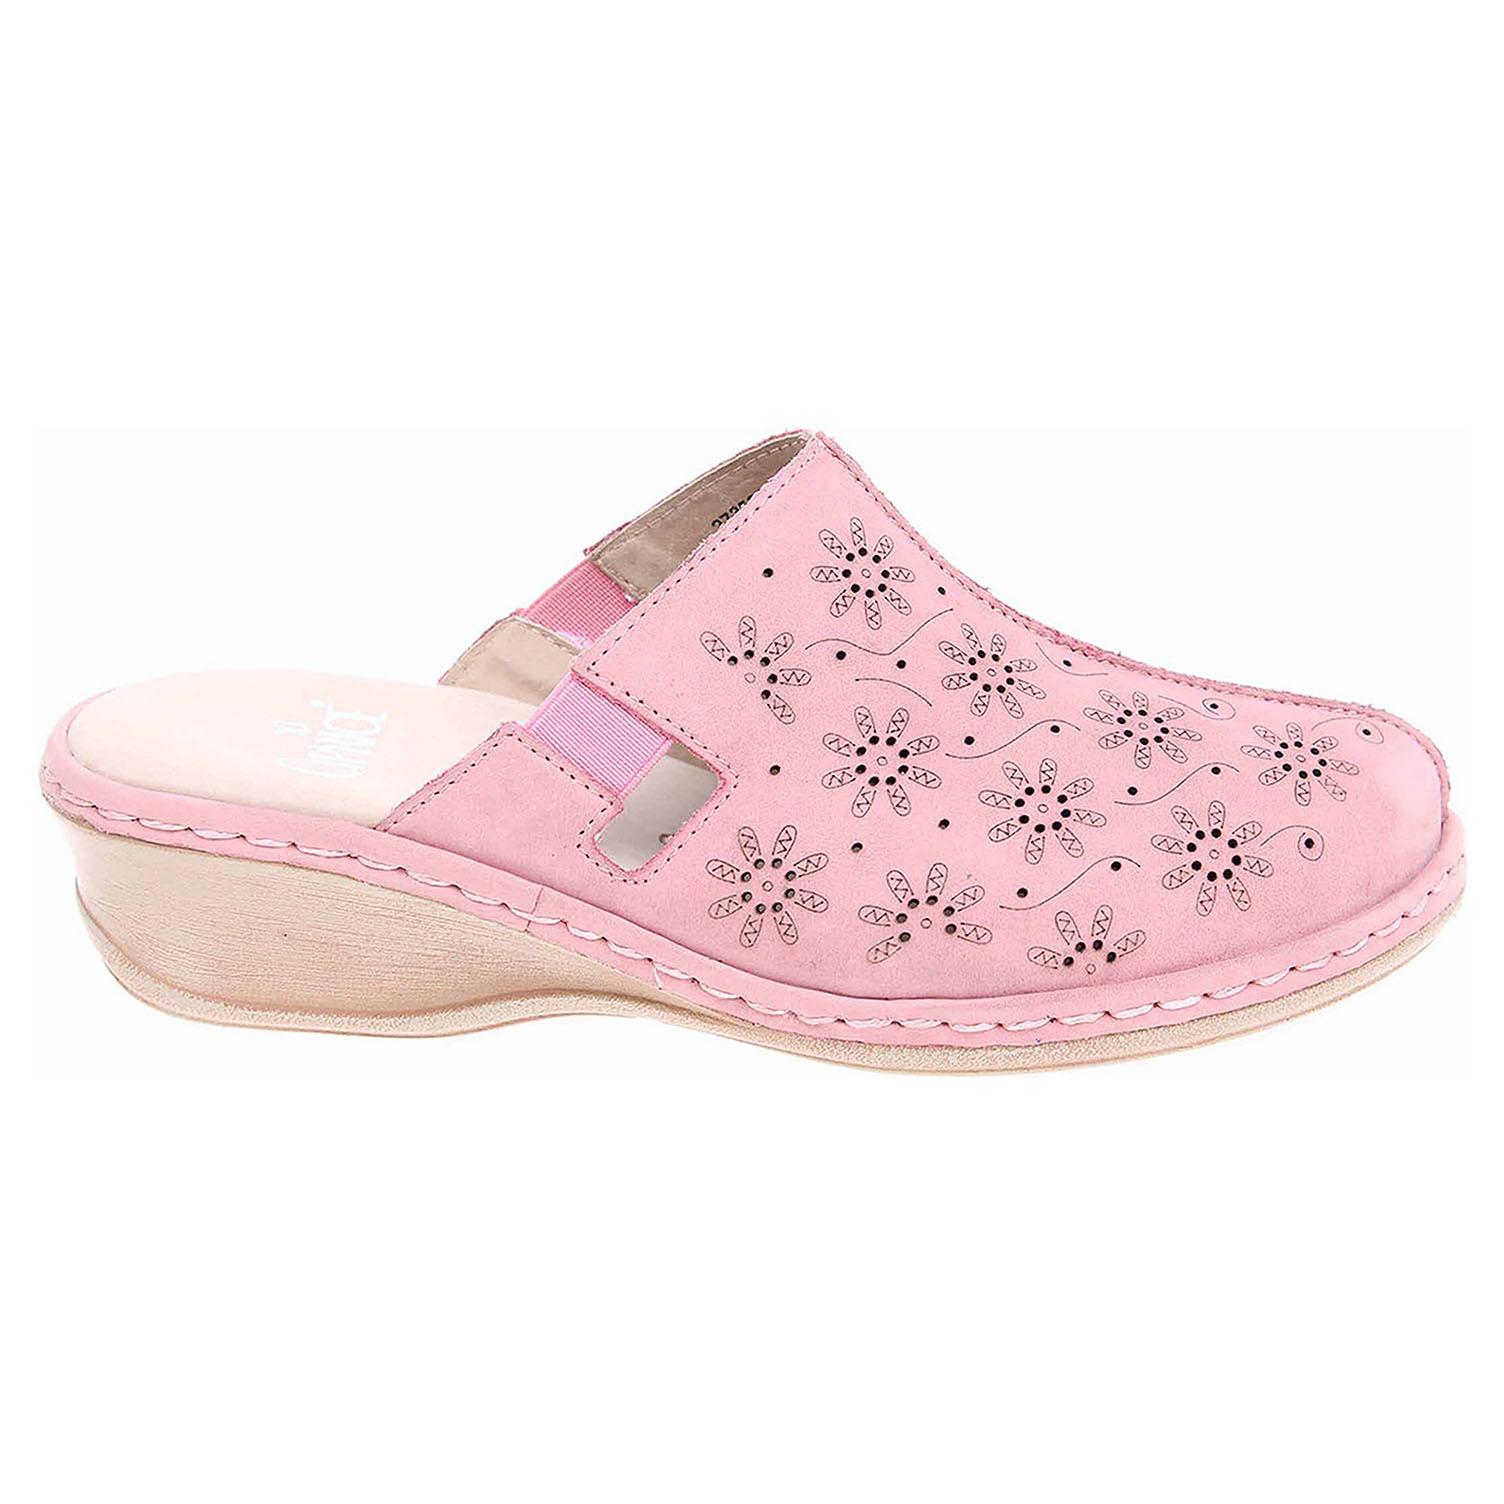 Ecco Caprice dámské pantofle 9-27350-28 růžové 23600818